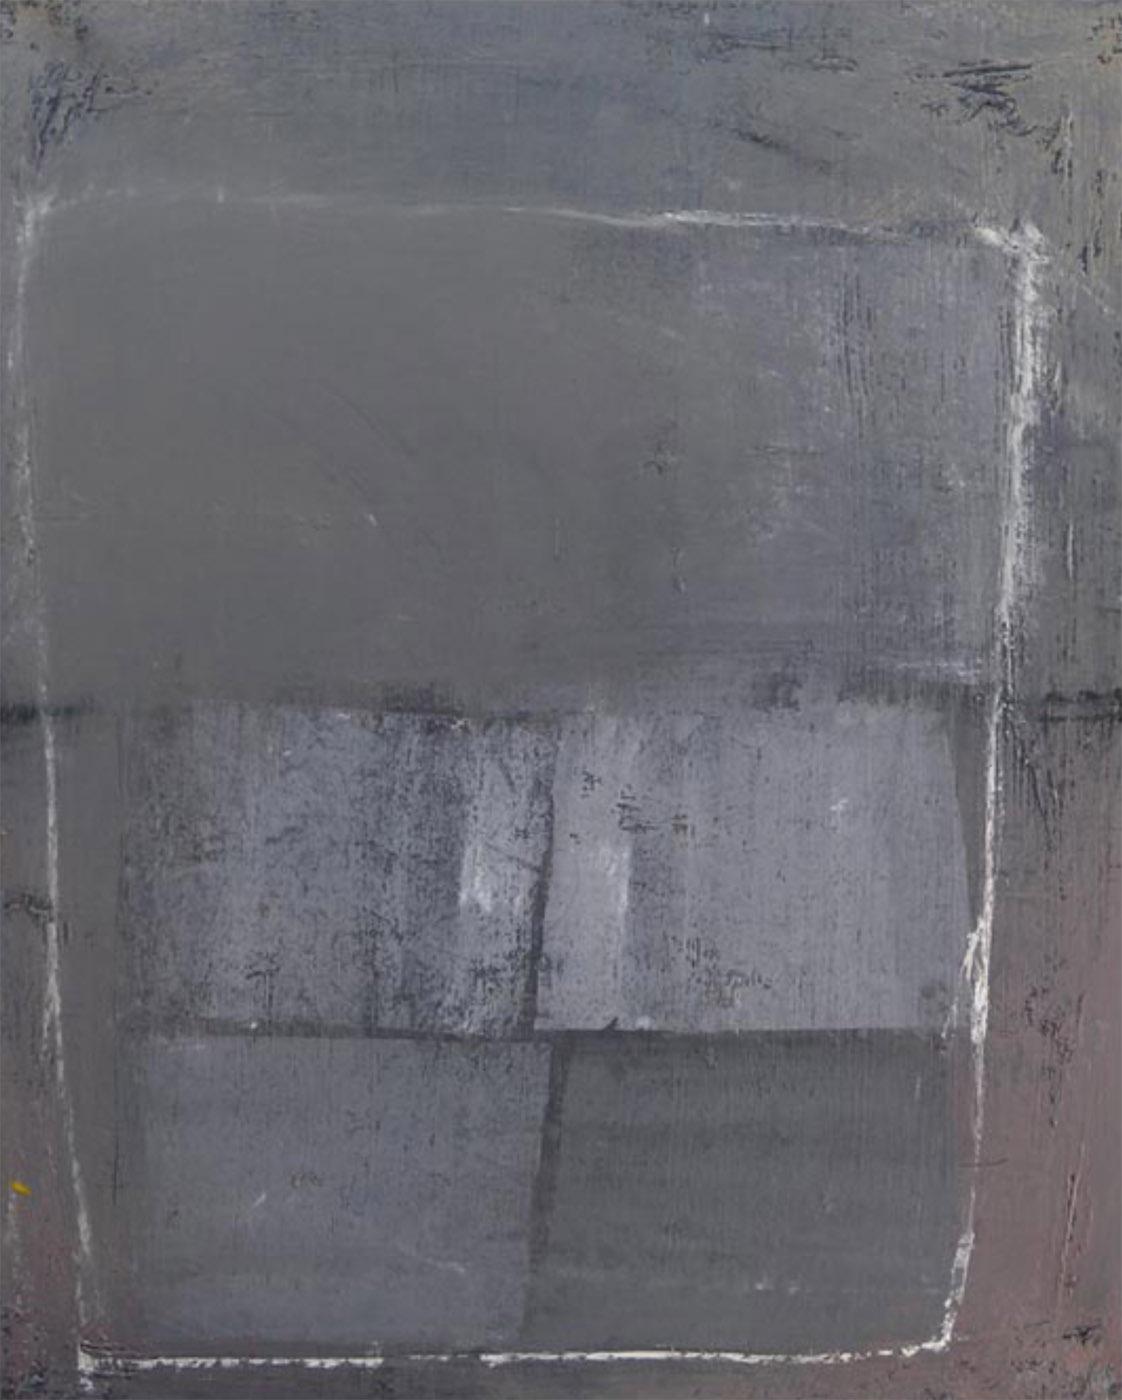 MARC FELD 1992 AMPLITUDE Huile sur toile 100 x 81 cm